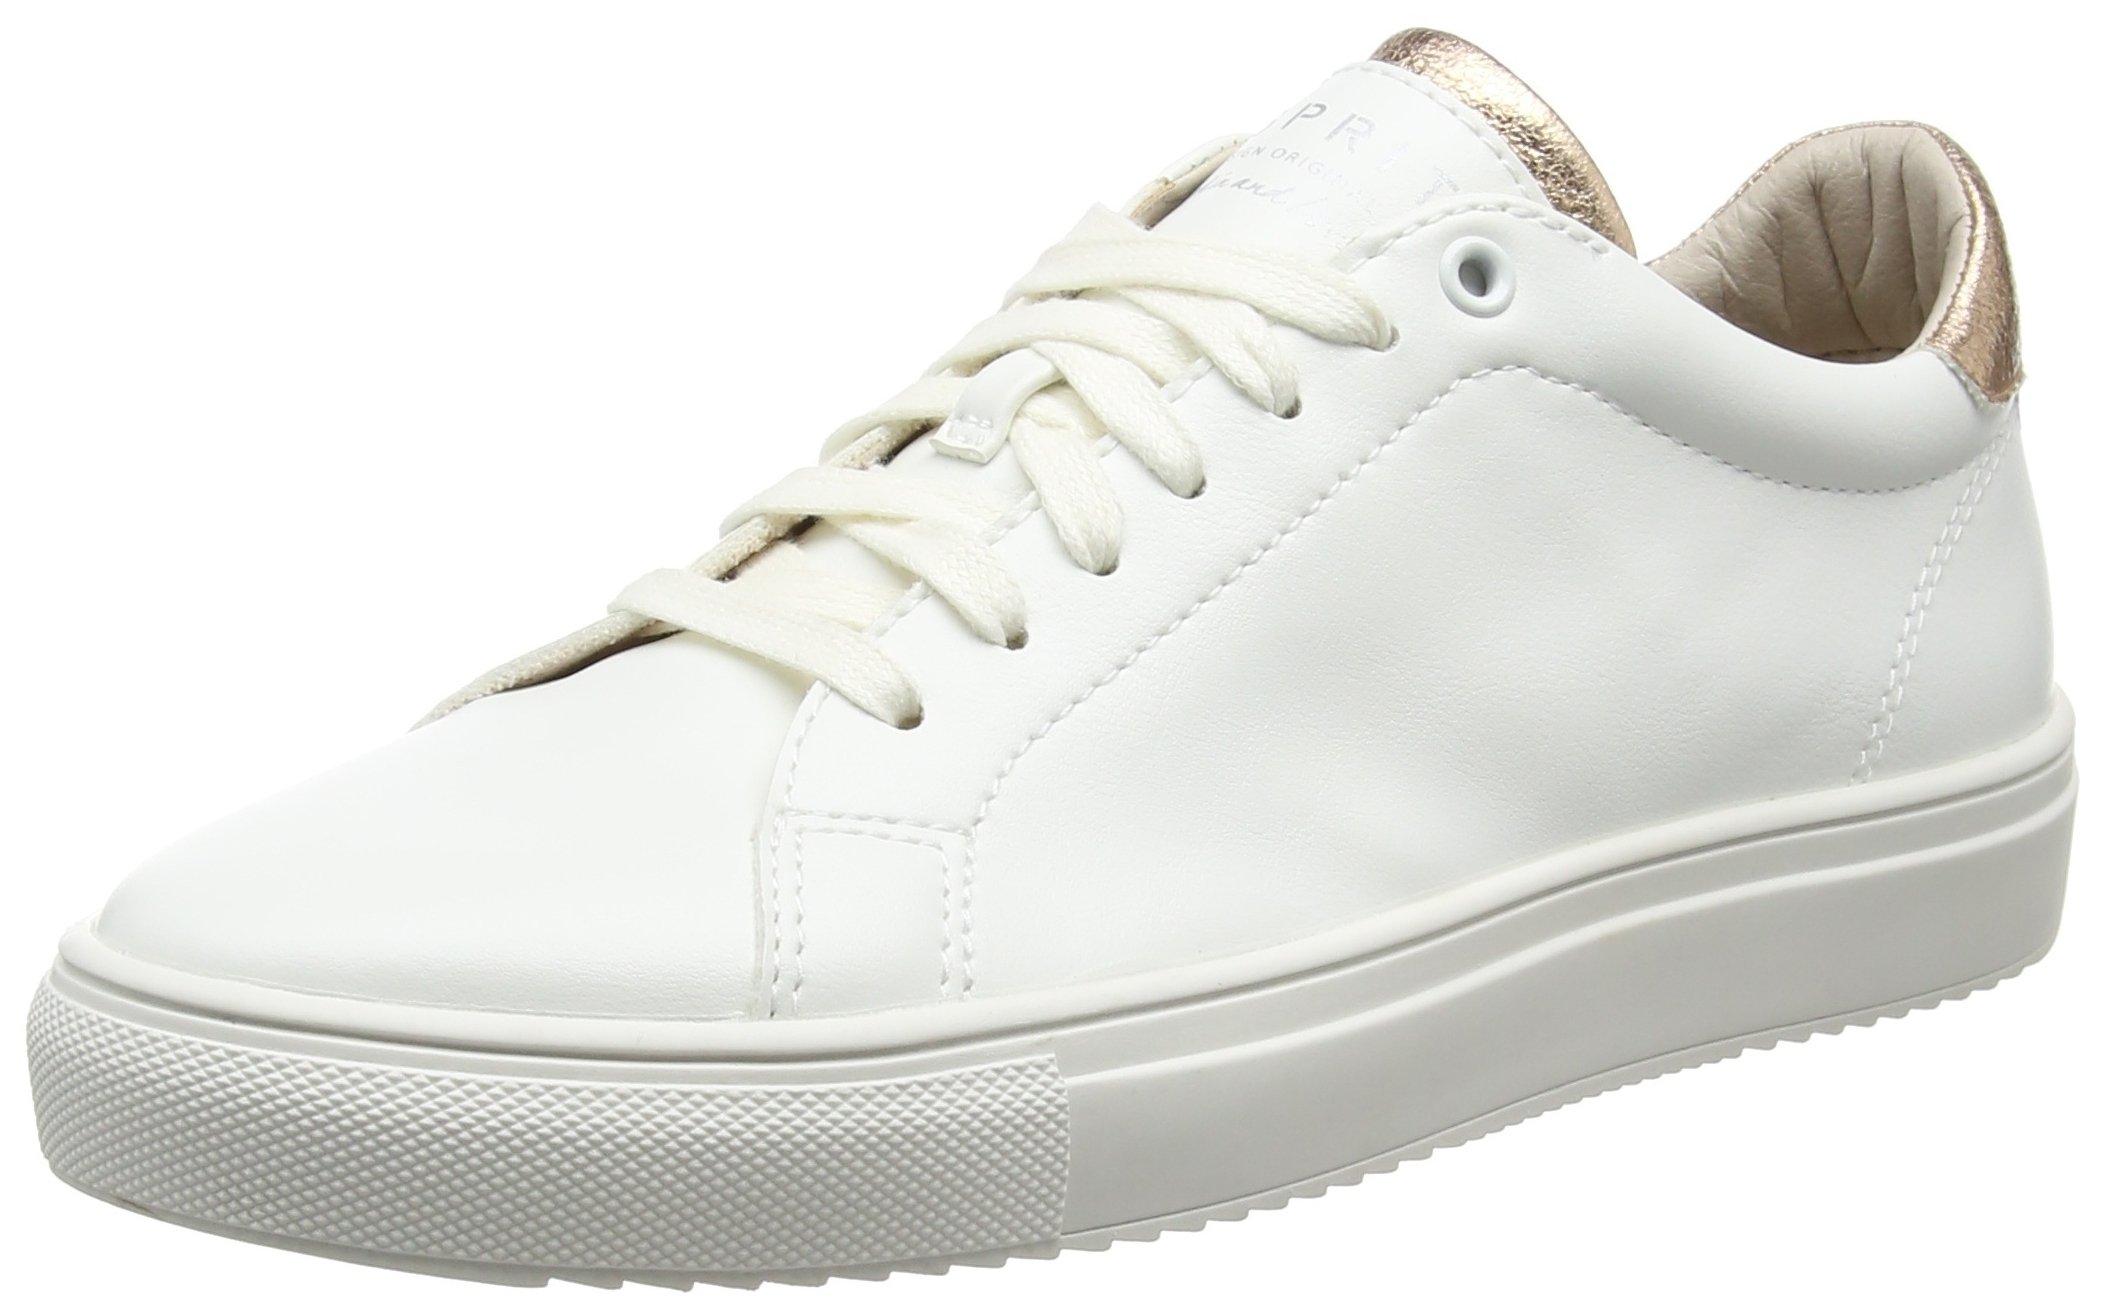 SandrineSneakers 10040 Esprit FemmeBlancwhite Eu Basses 3AjqS4LcR5